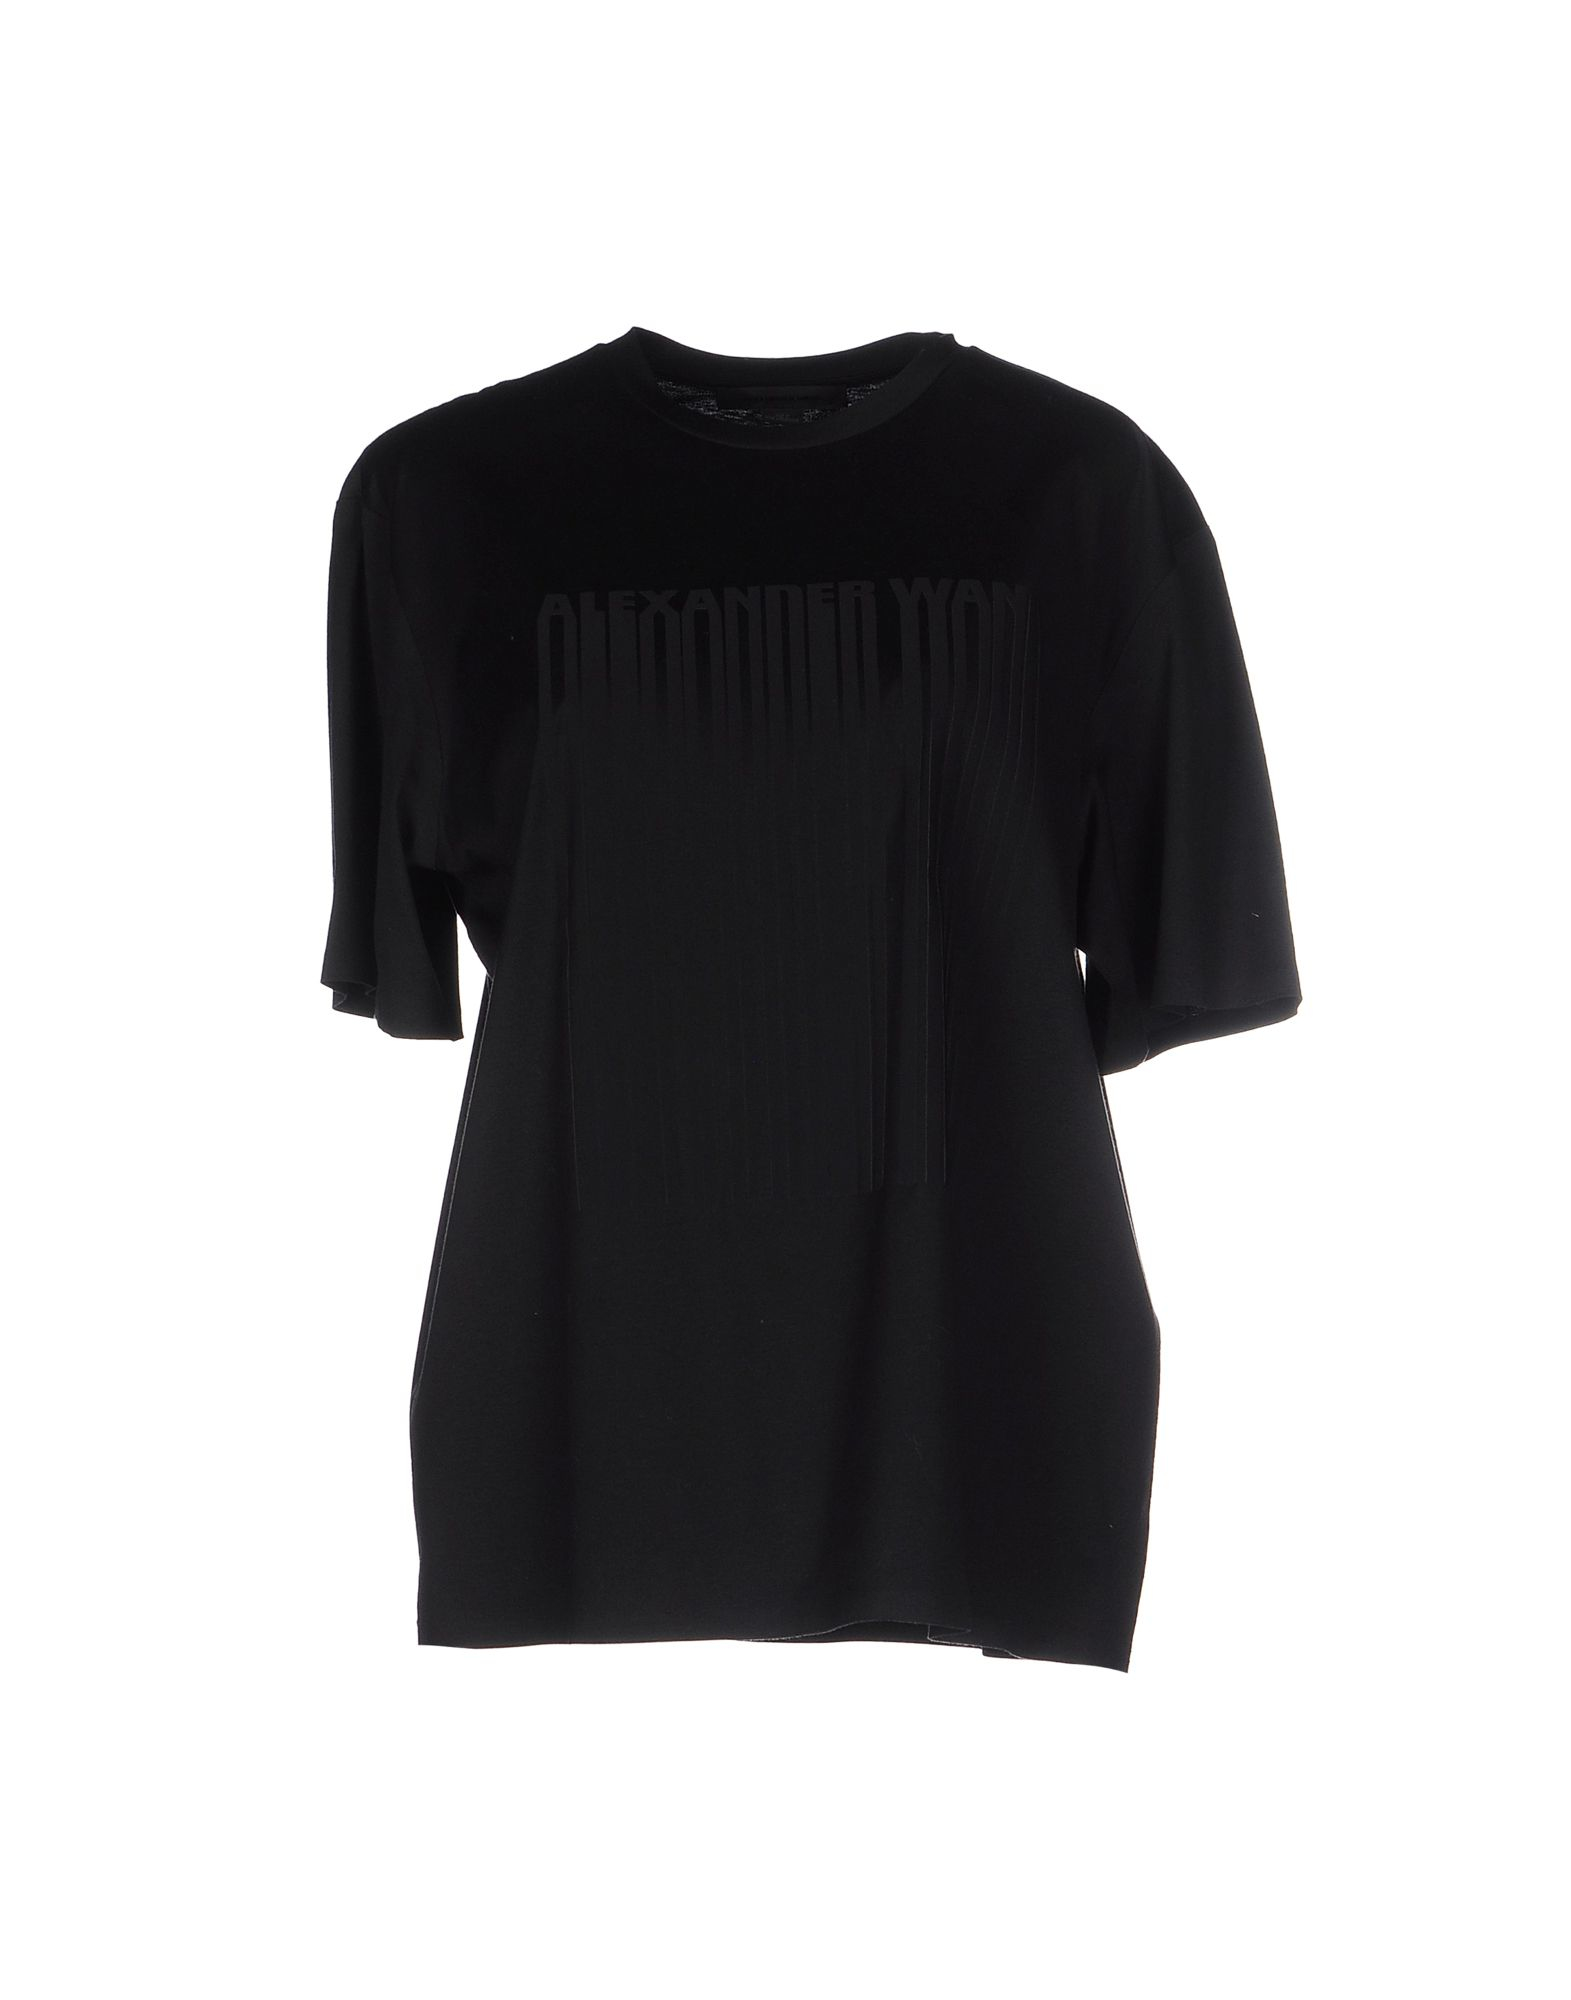 alexander wang t shirt in black lyst. Black Bedroom Furniture Sets. Home Design Ideas